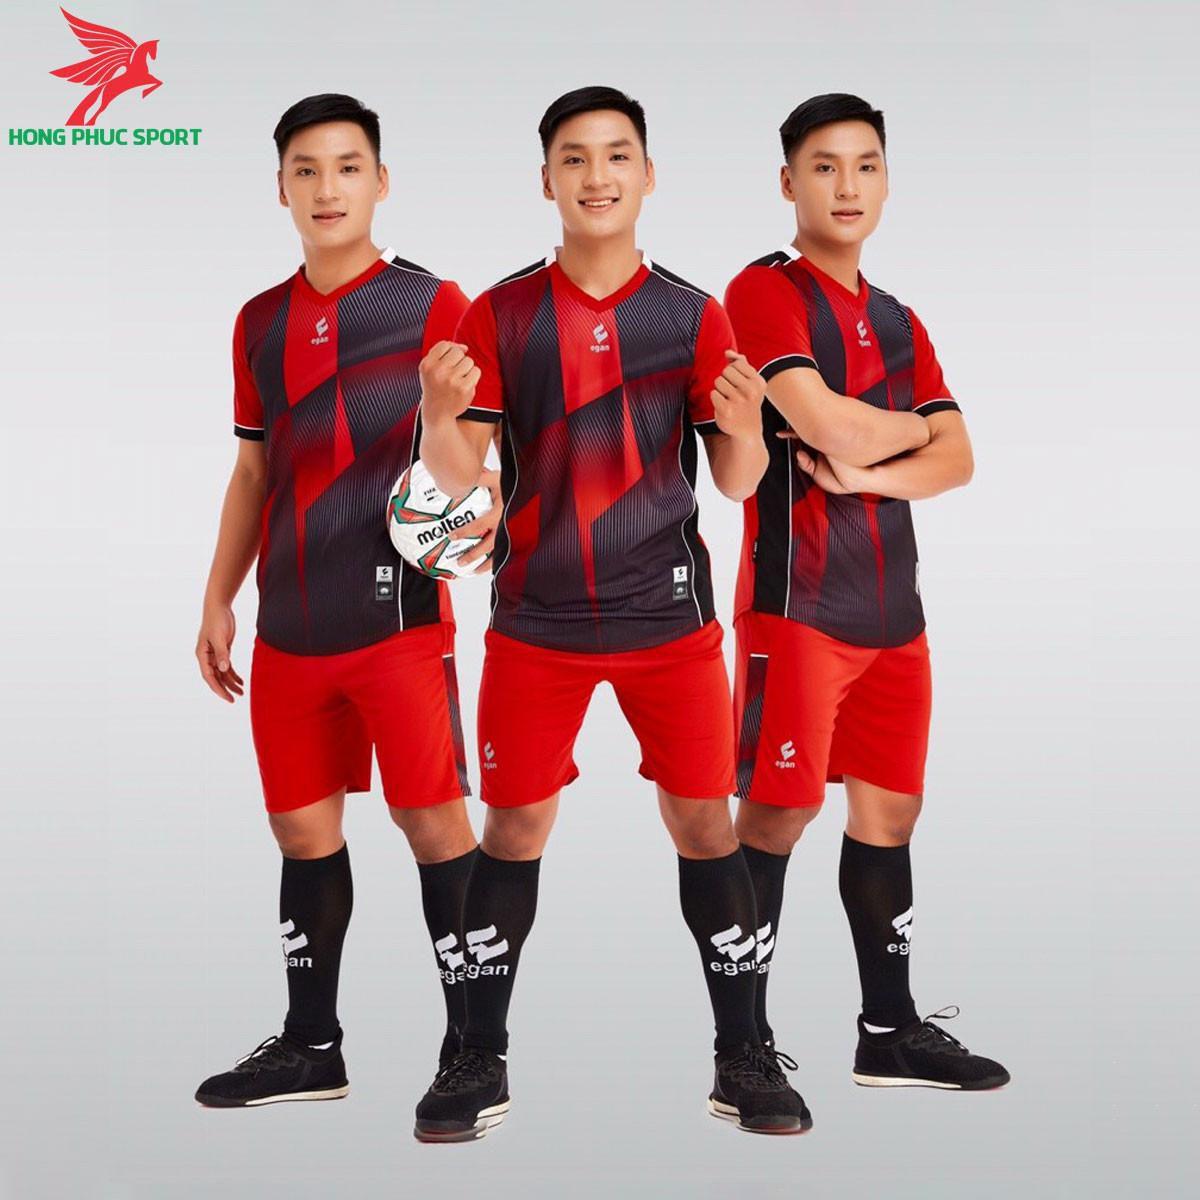 https://cdn.hongphucsport.com/unsafe/s4.shopbay.vn/files/285/ao-da-bong-khong-logo-egan-victory-mau-do-605087b1d7cac.jpg